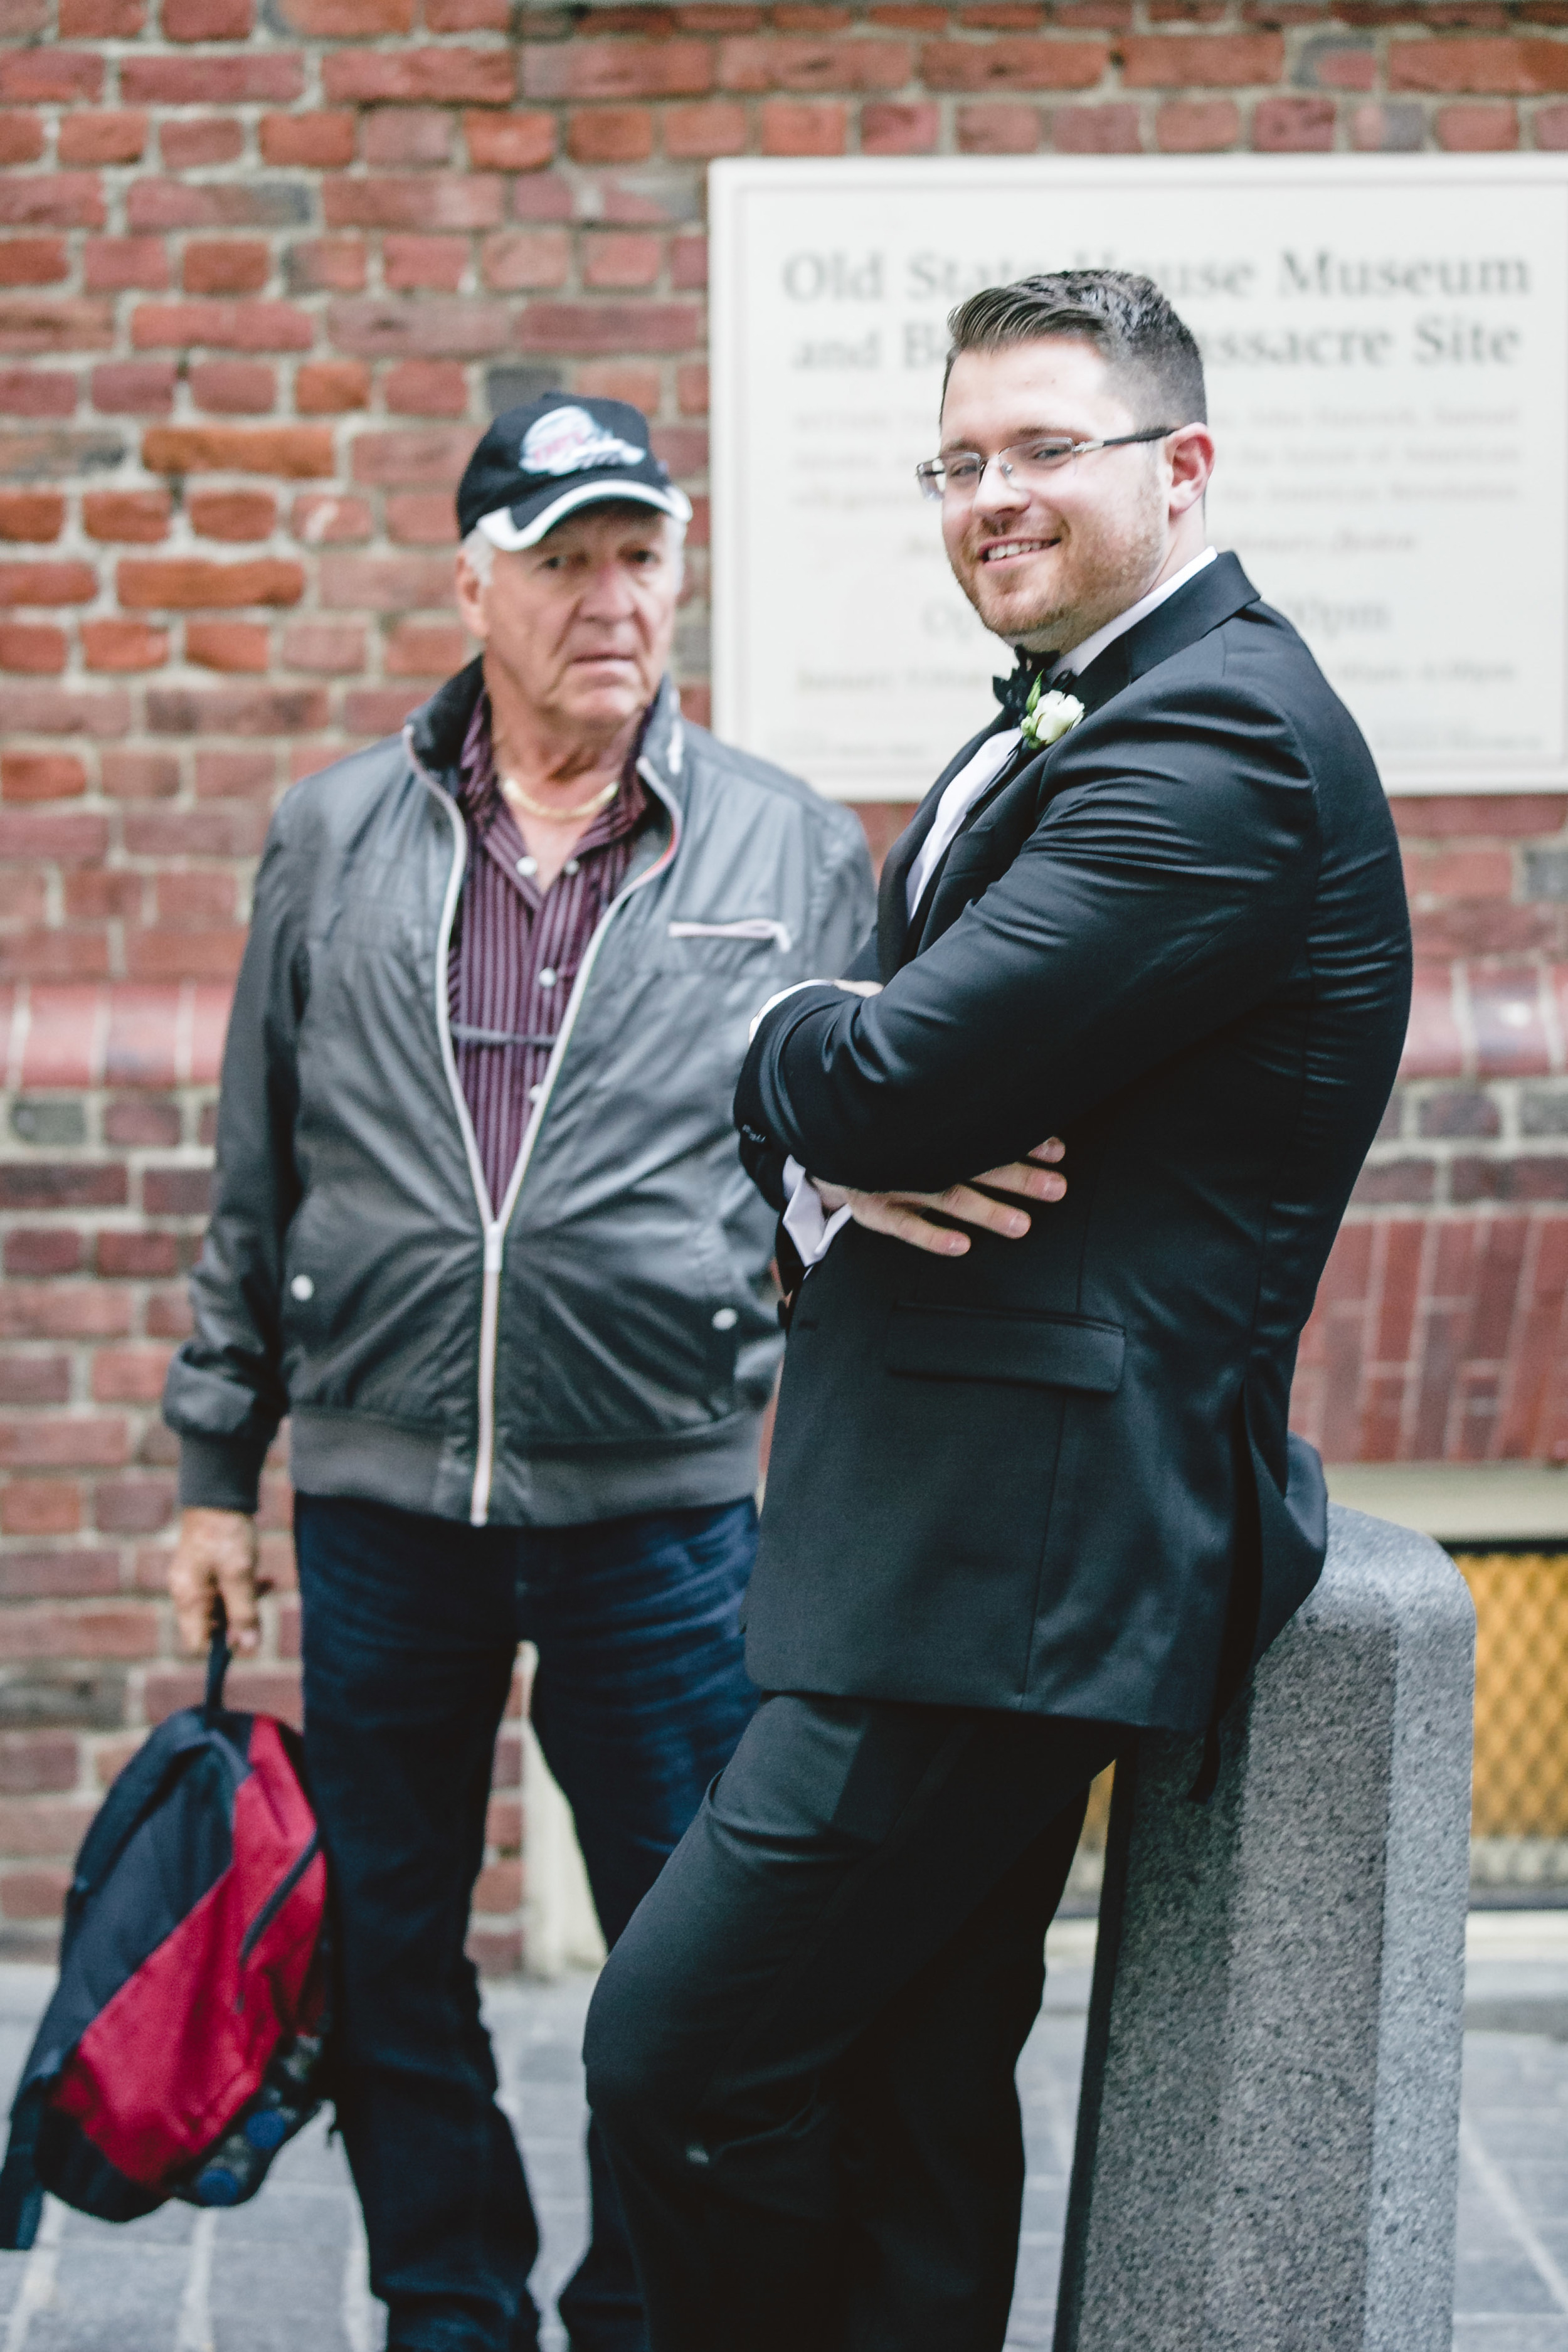 Luxurious-Jewish-Halloween-Wedding-State-Room-Boston-MA-Photojournalistic-Wedding-Photography-Jacek-Dolata.jpg